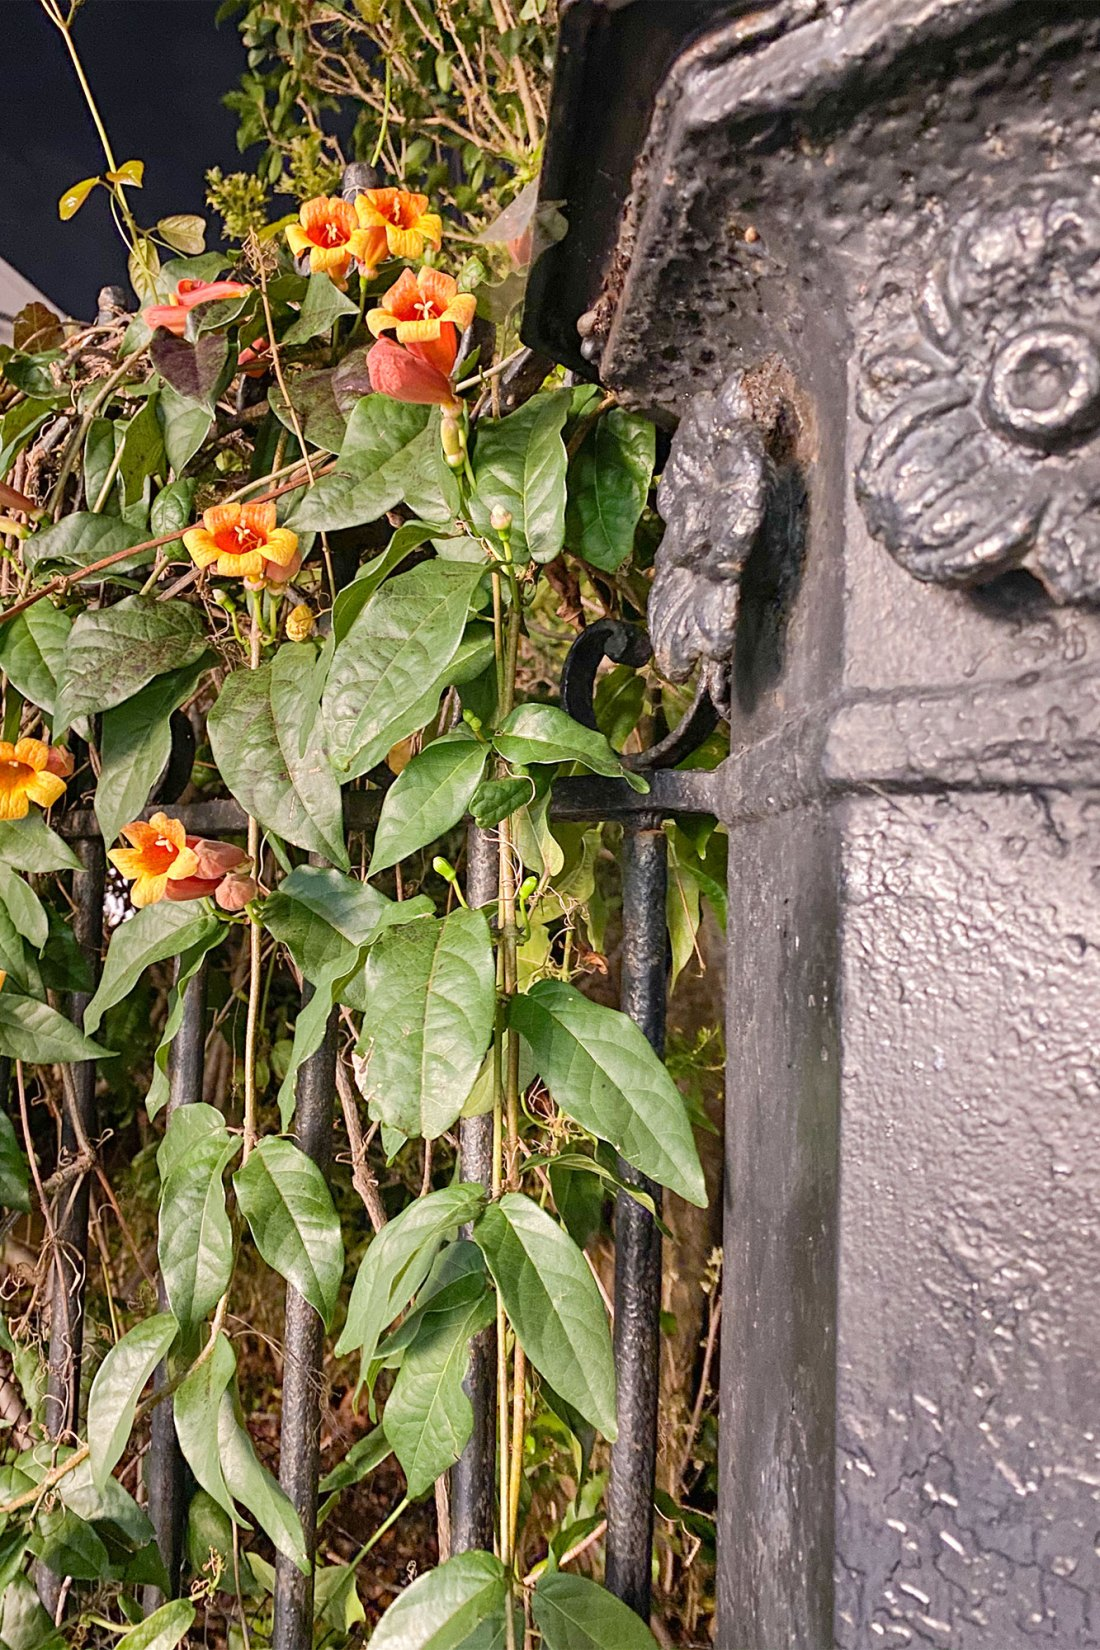 Orange flowers next to ornate fence pole